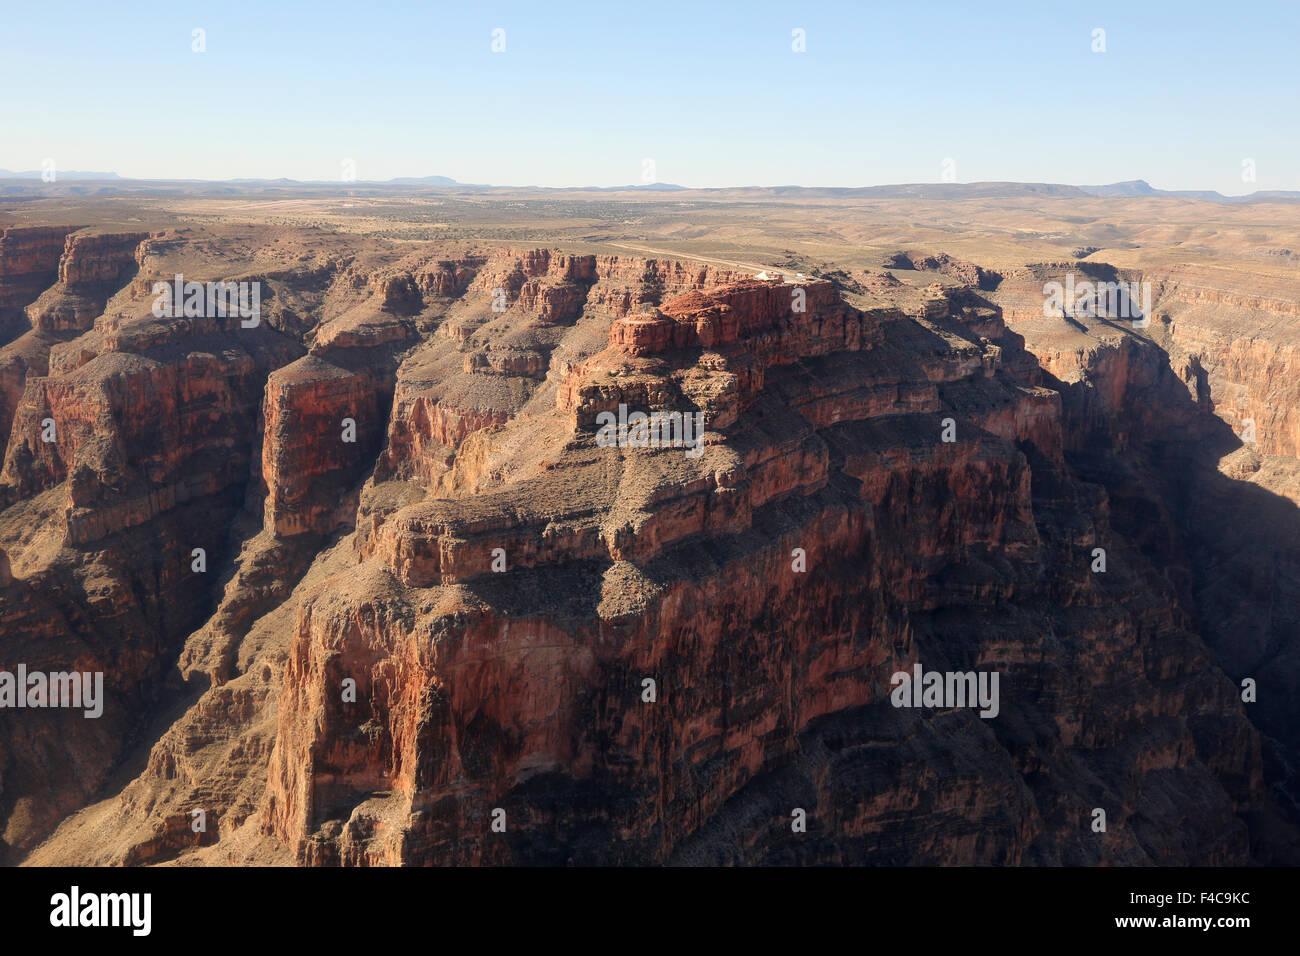 Grand Canyon Luftbild - Stock Image